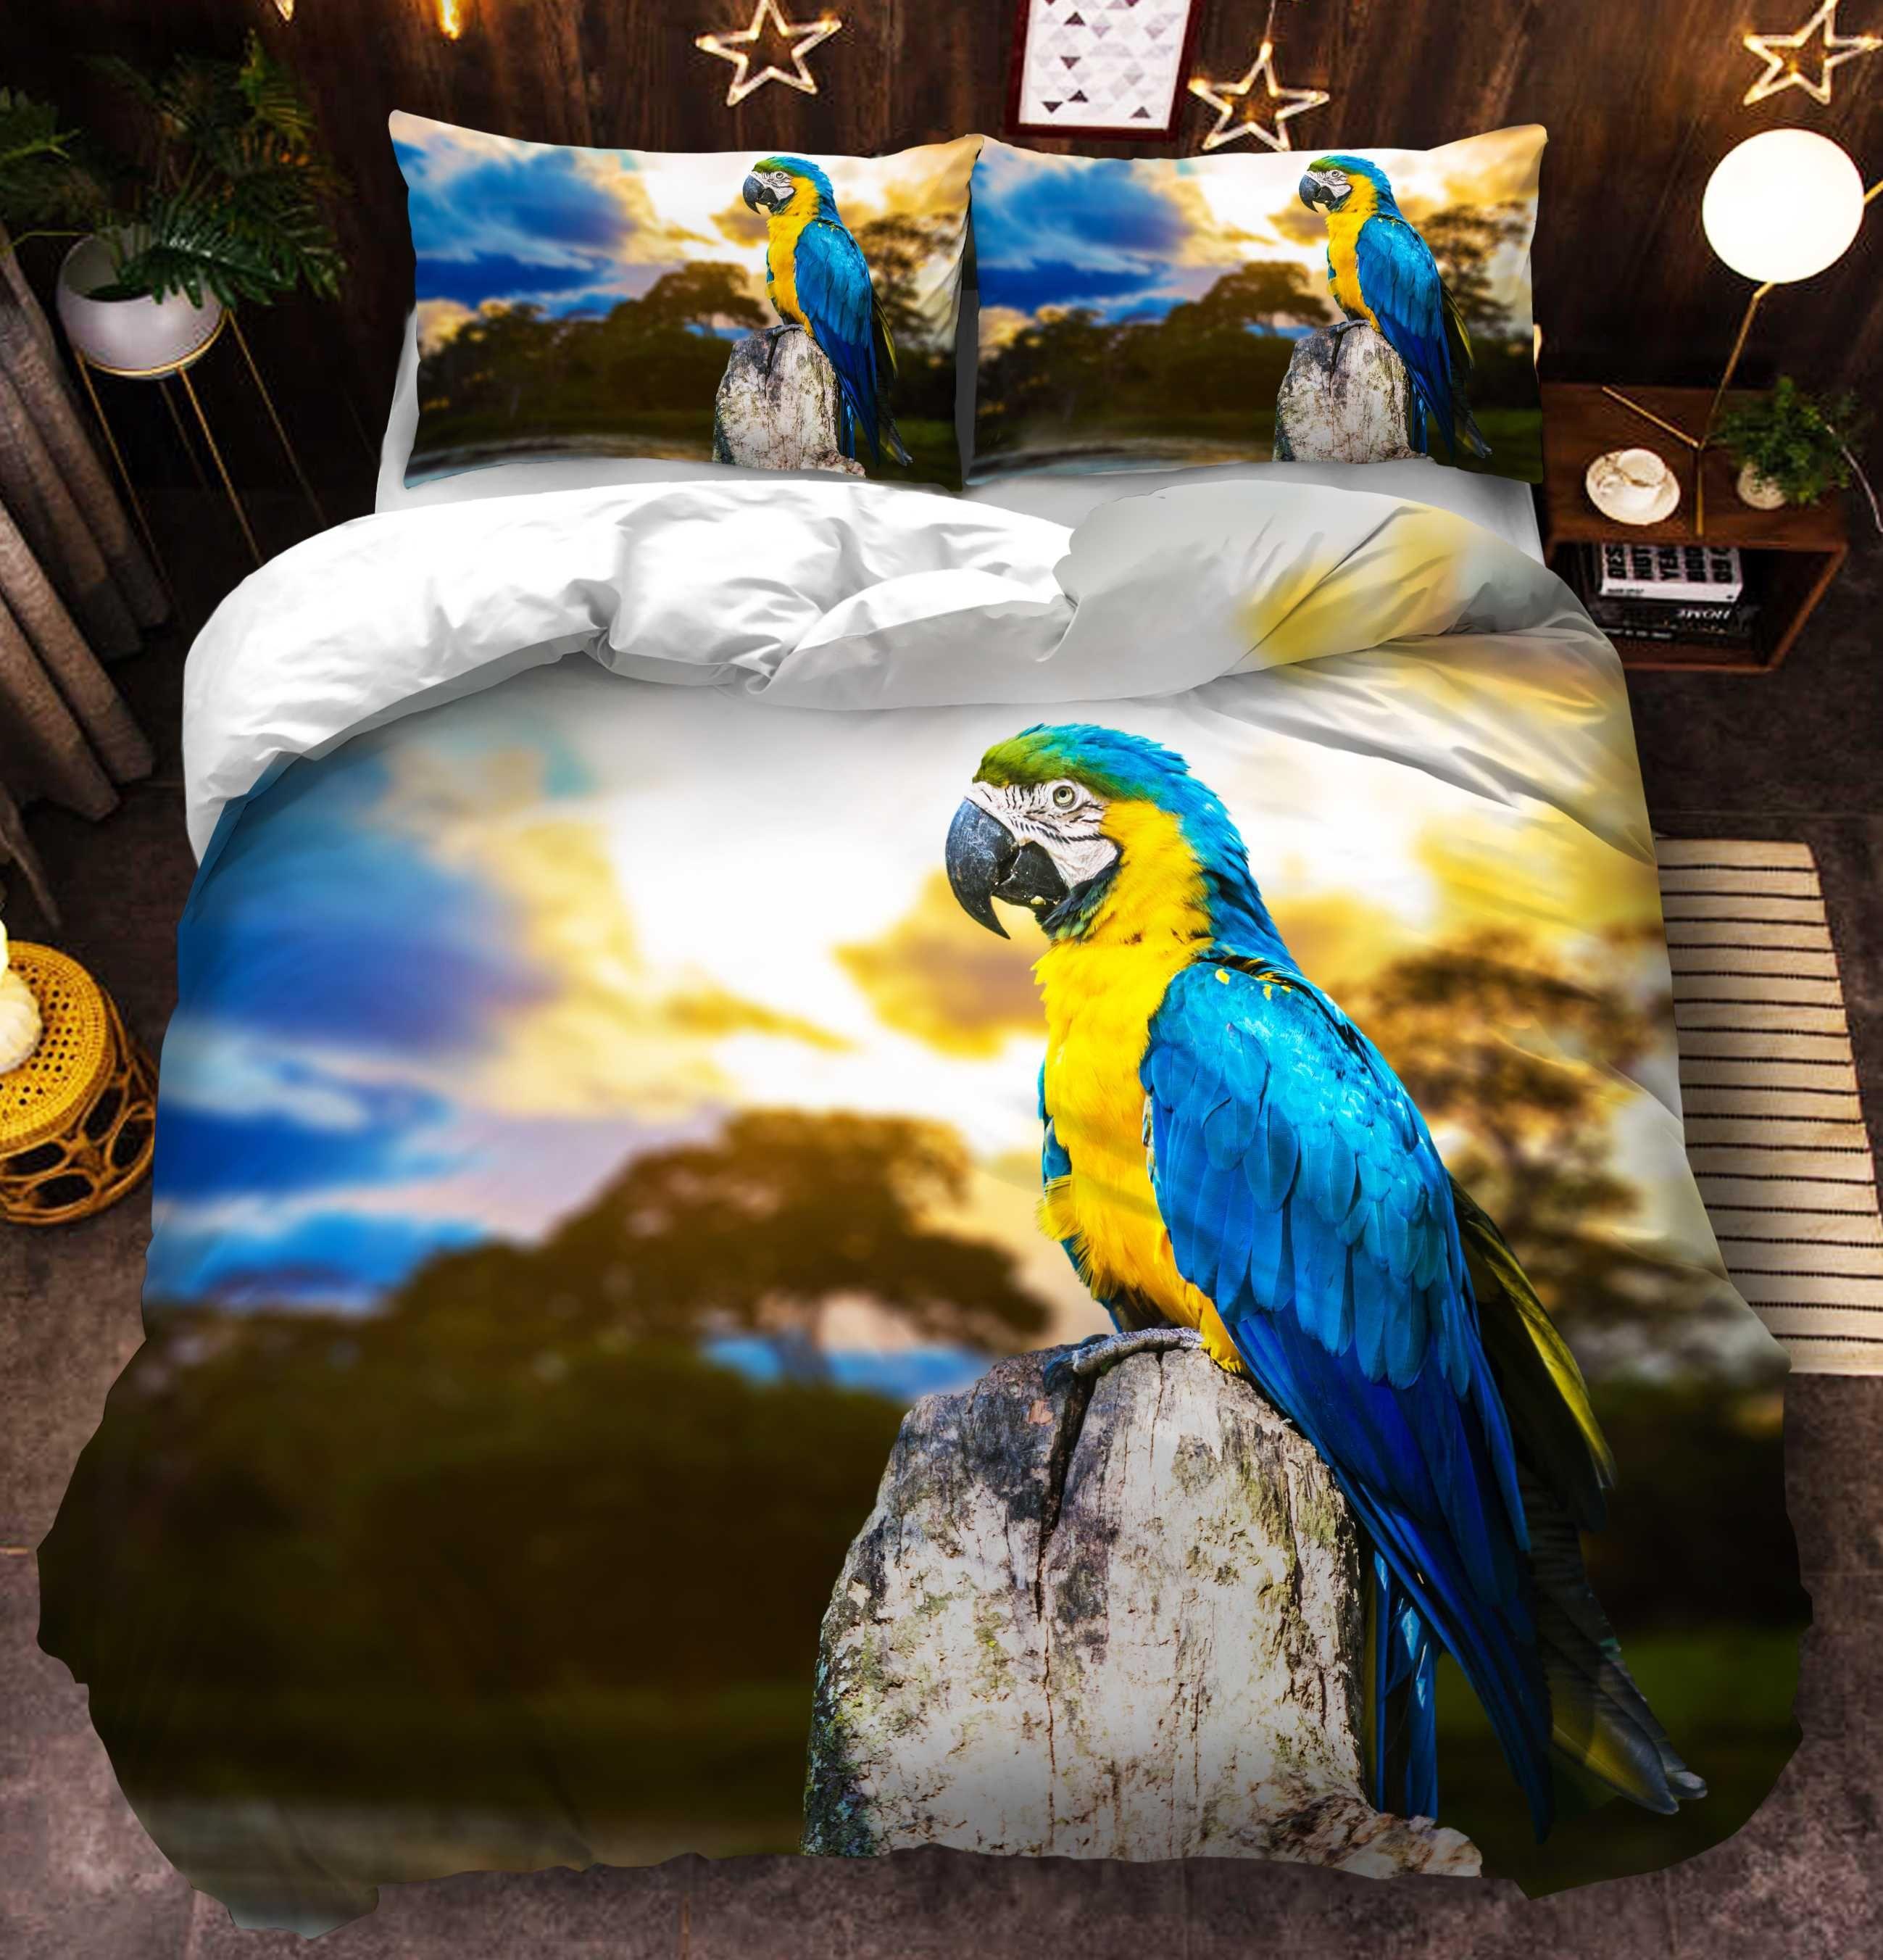 Parrot Пододеяльник Твин Полный Queen King Super King Size Double Bird пододеяльник Одеяло Обложка наволочки 3шт